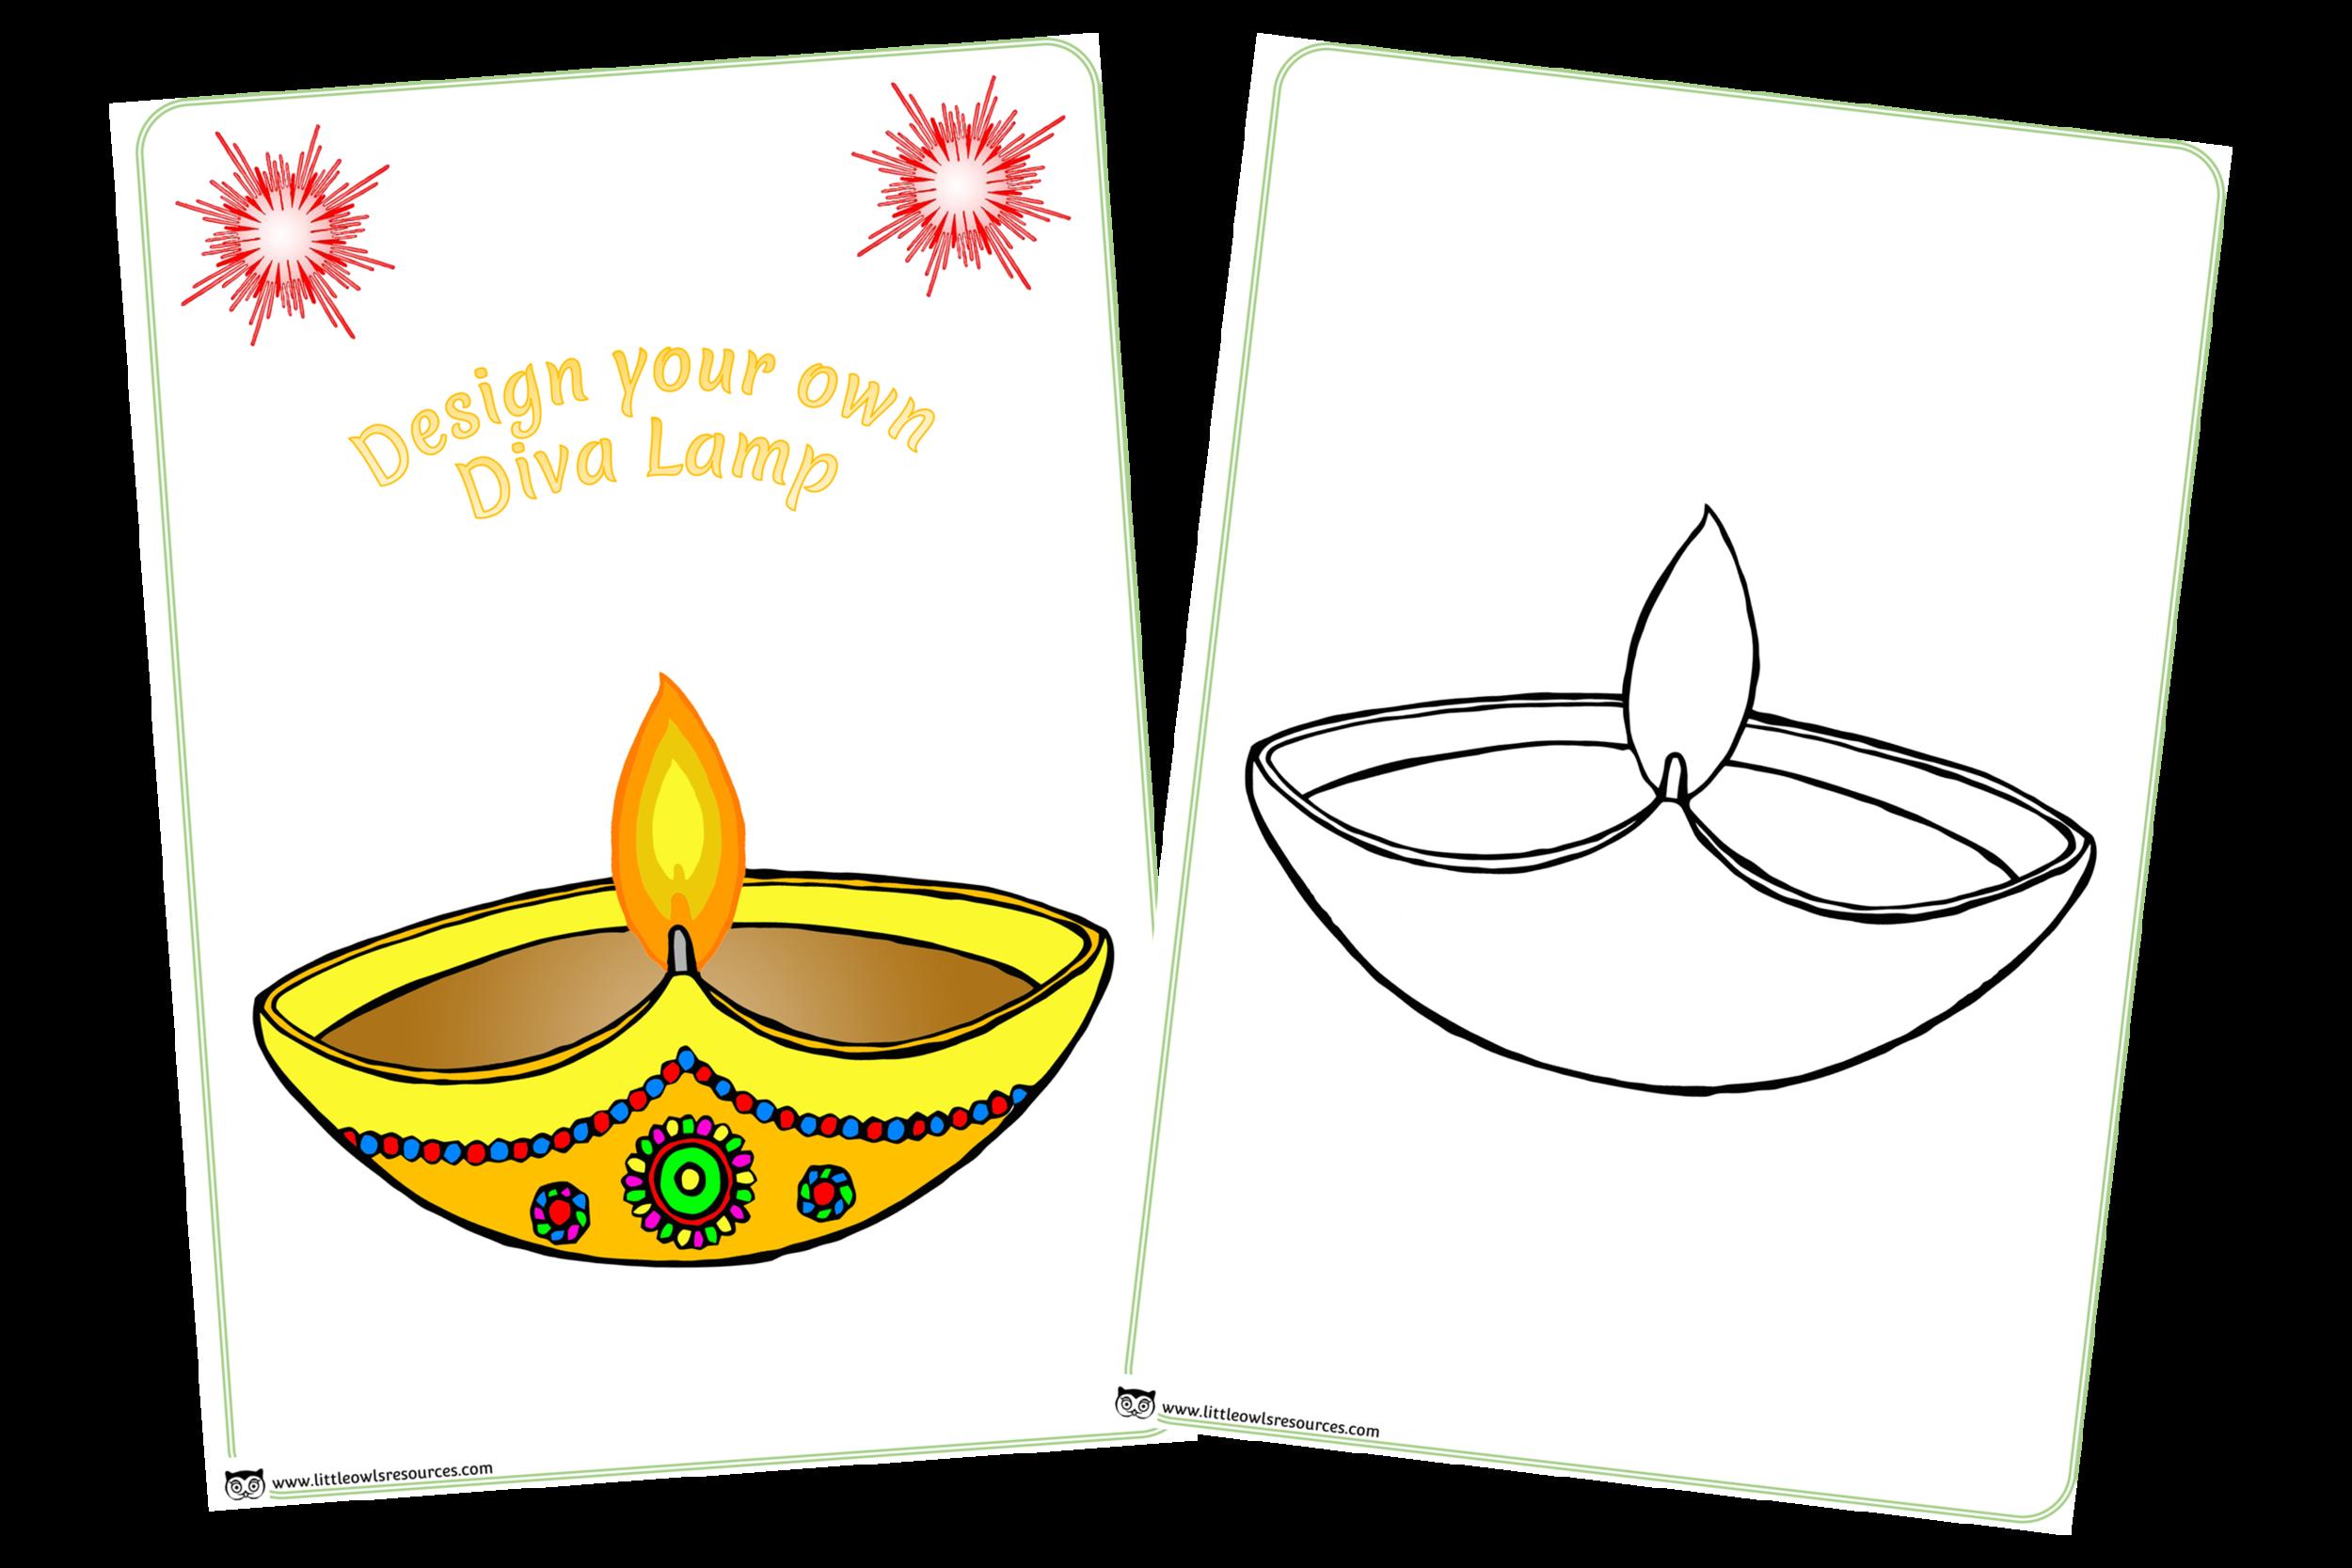 Free design printable early. Lamp clipart diva lamp